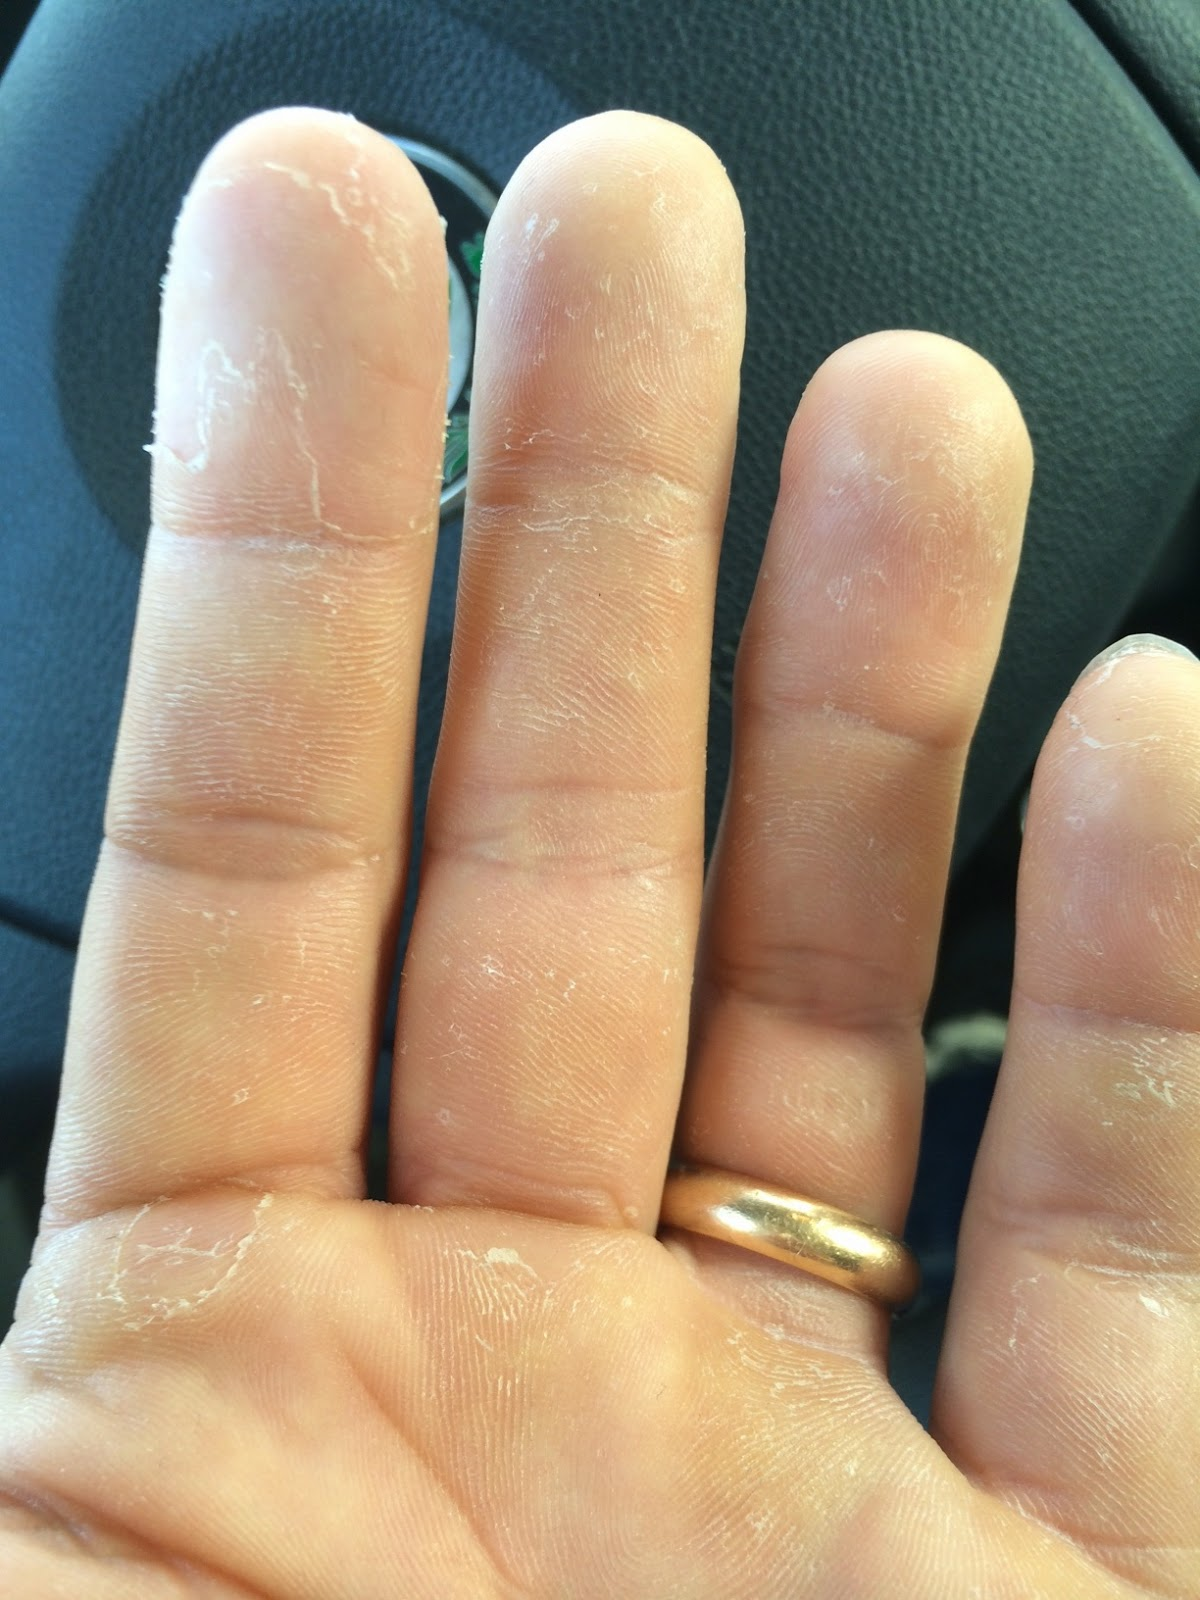 ömsar skinn på händerna